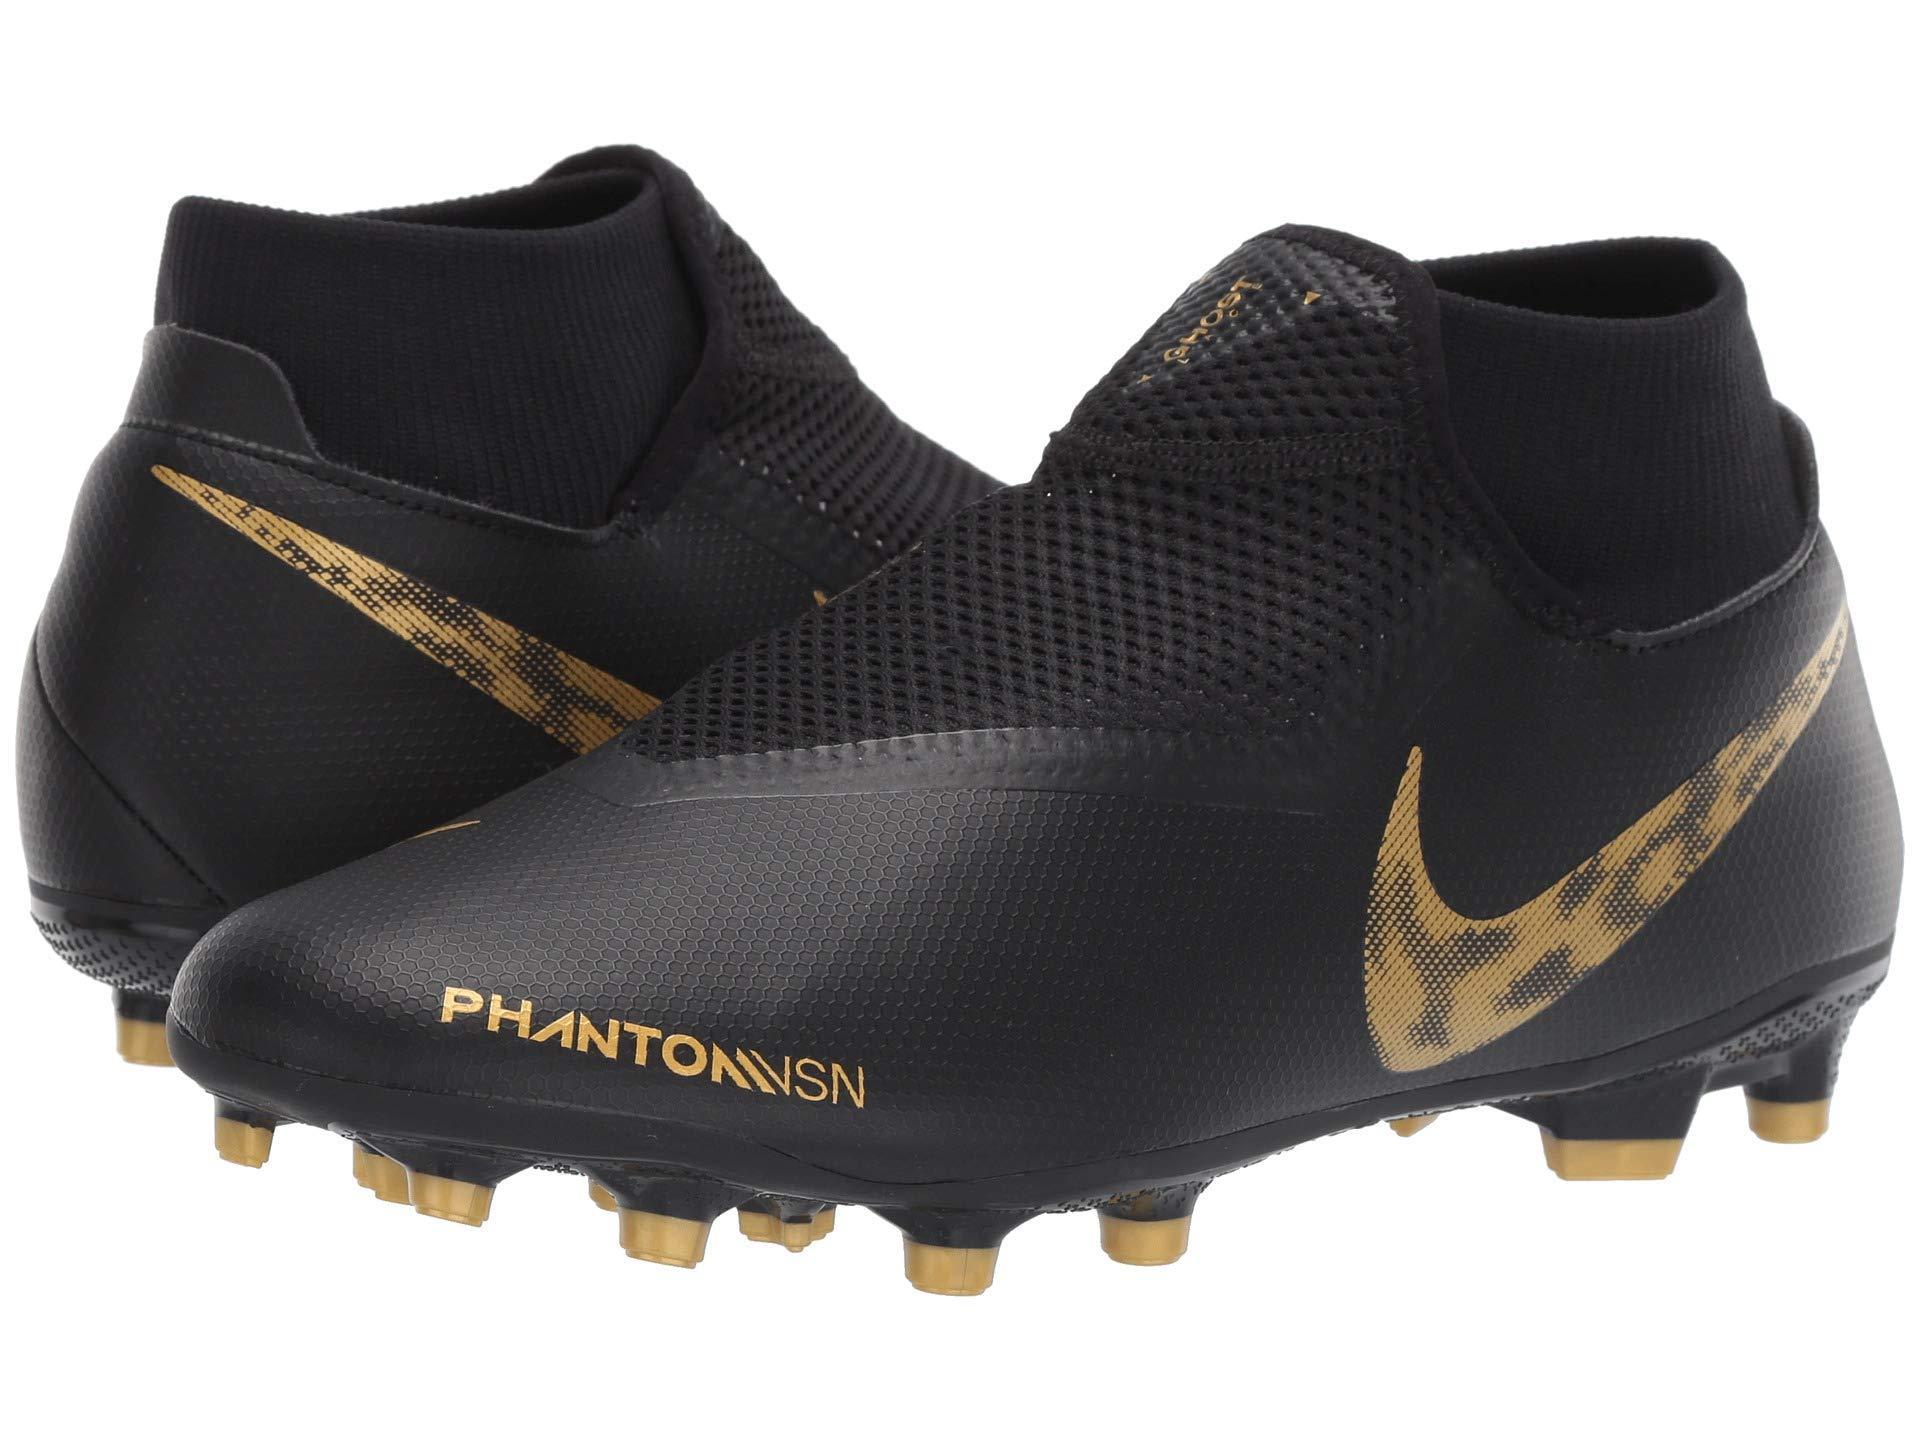 7d59951191e1 Nike Phantom Vsn Academy Df Mg (black/metallic Vivid Gold) Men's ...